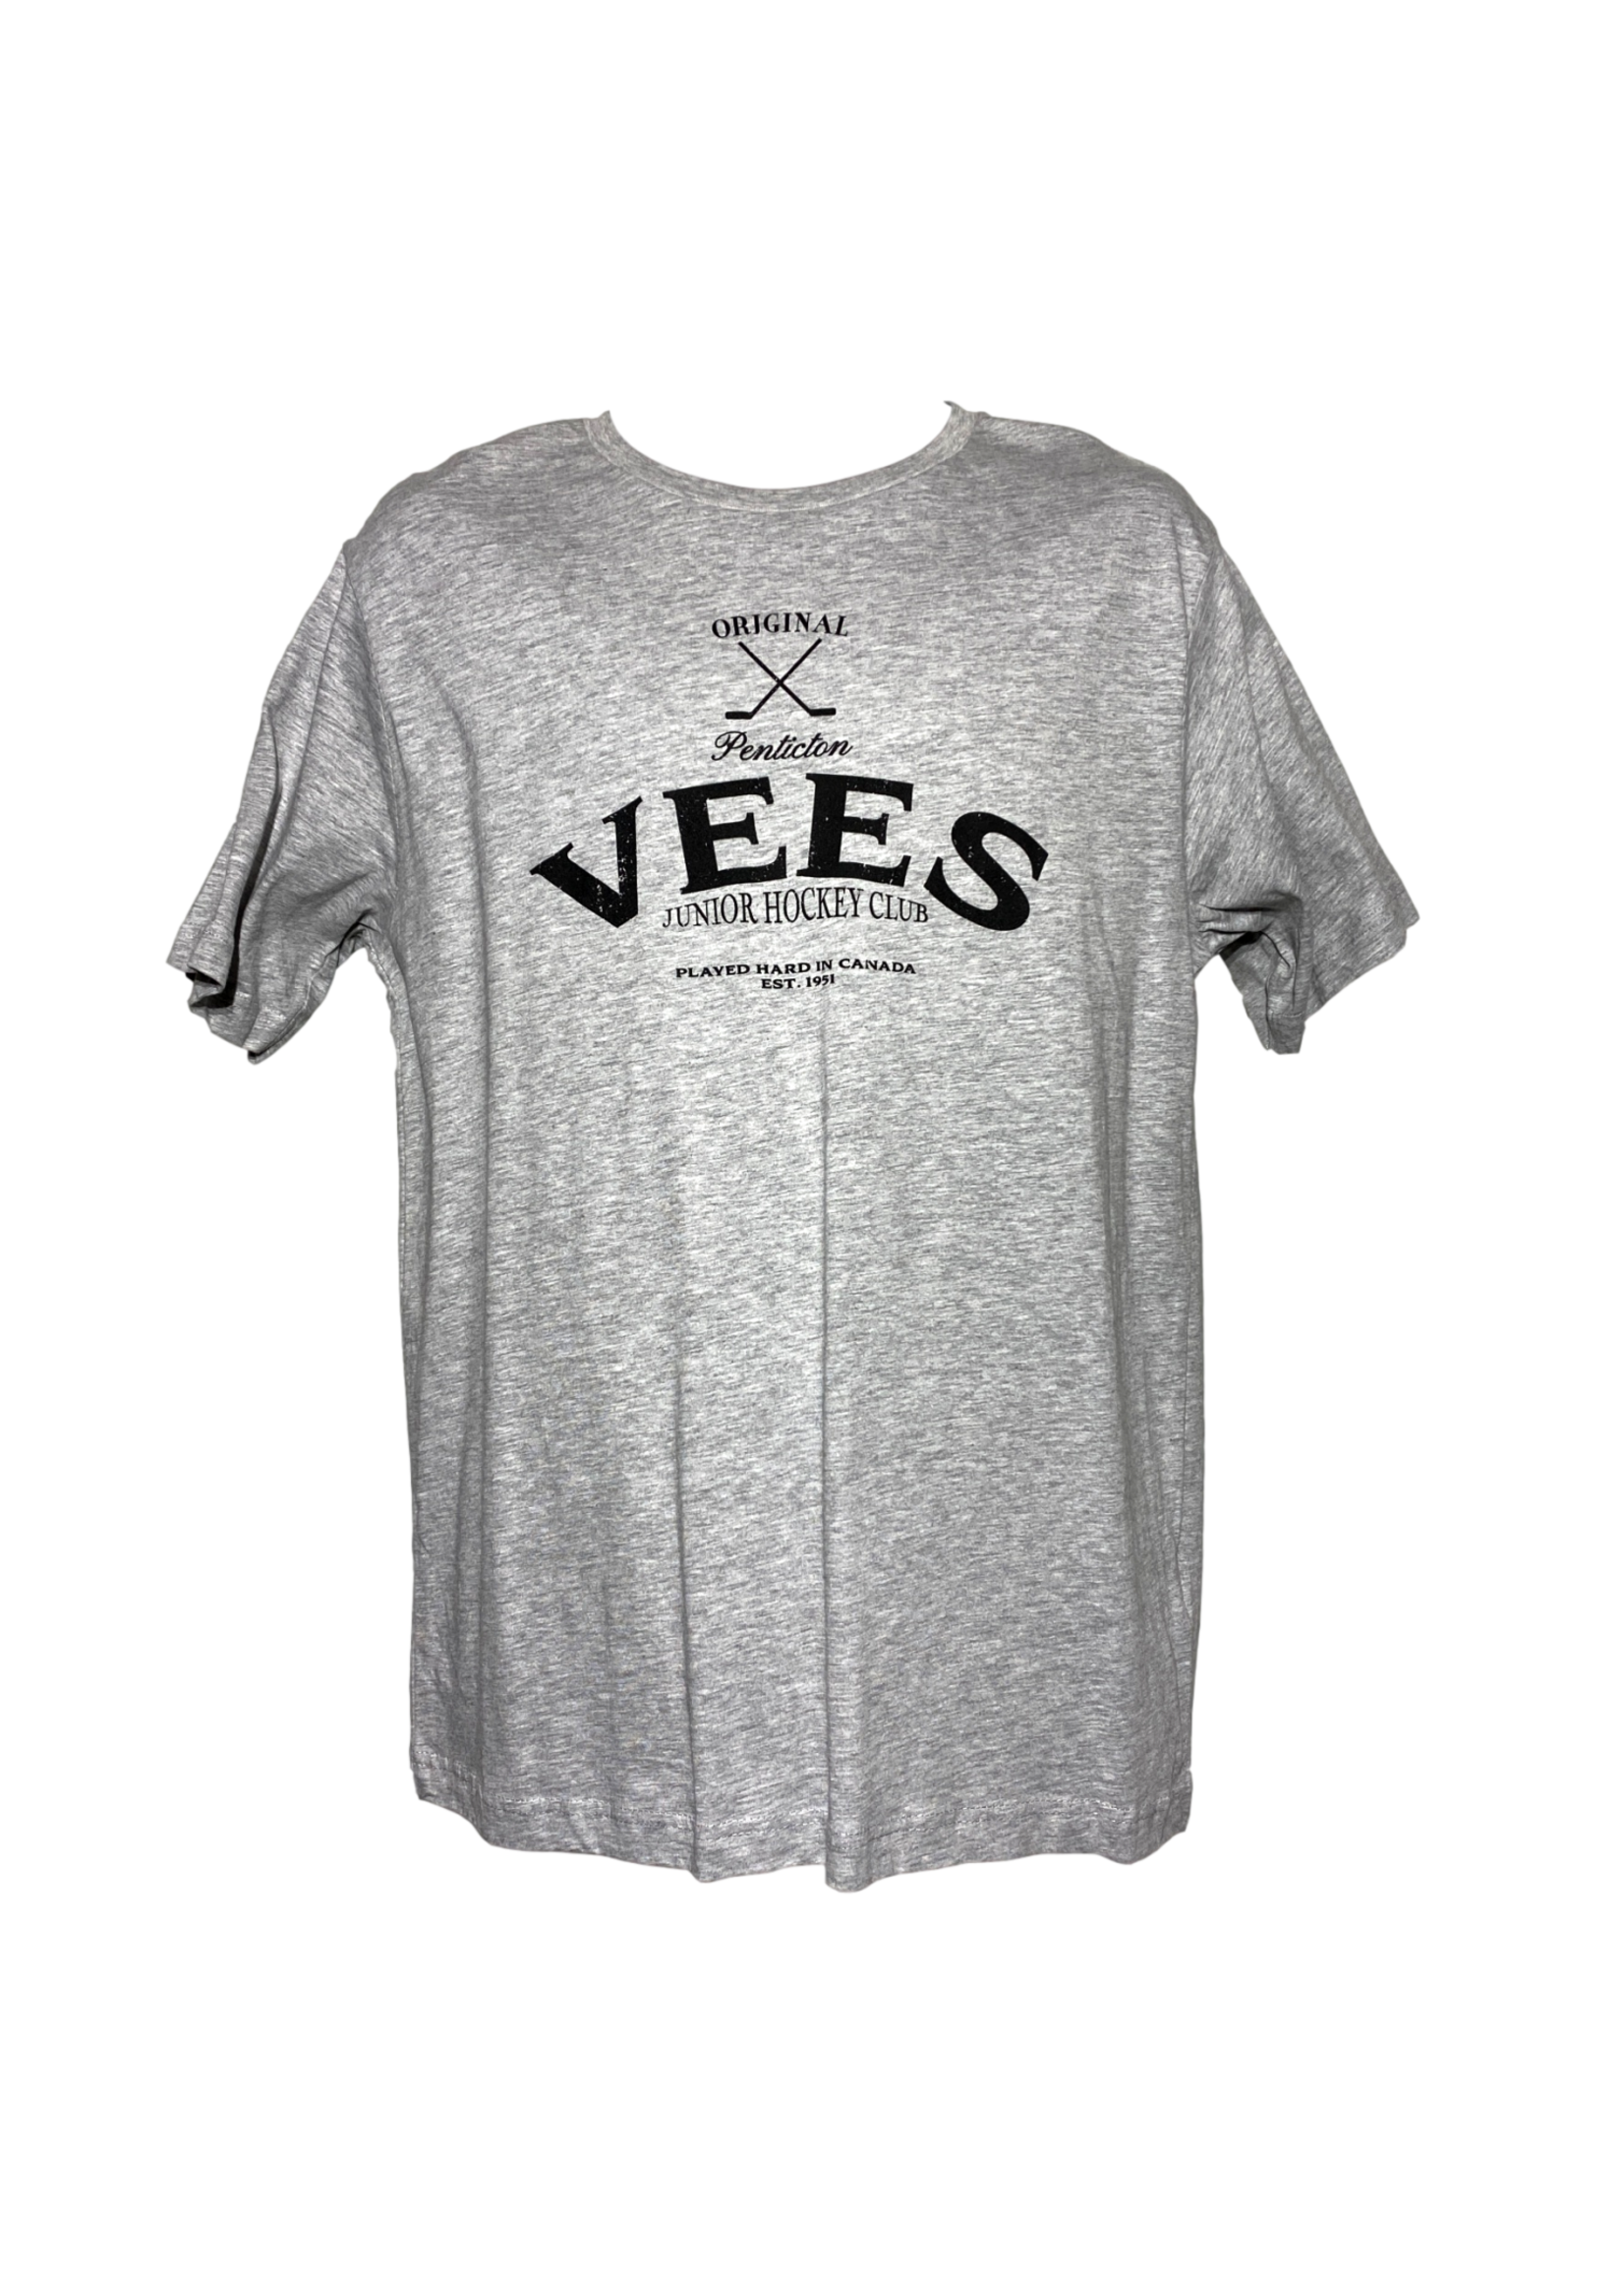 Vees Mens Grey T Shirt Black Logo